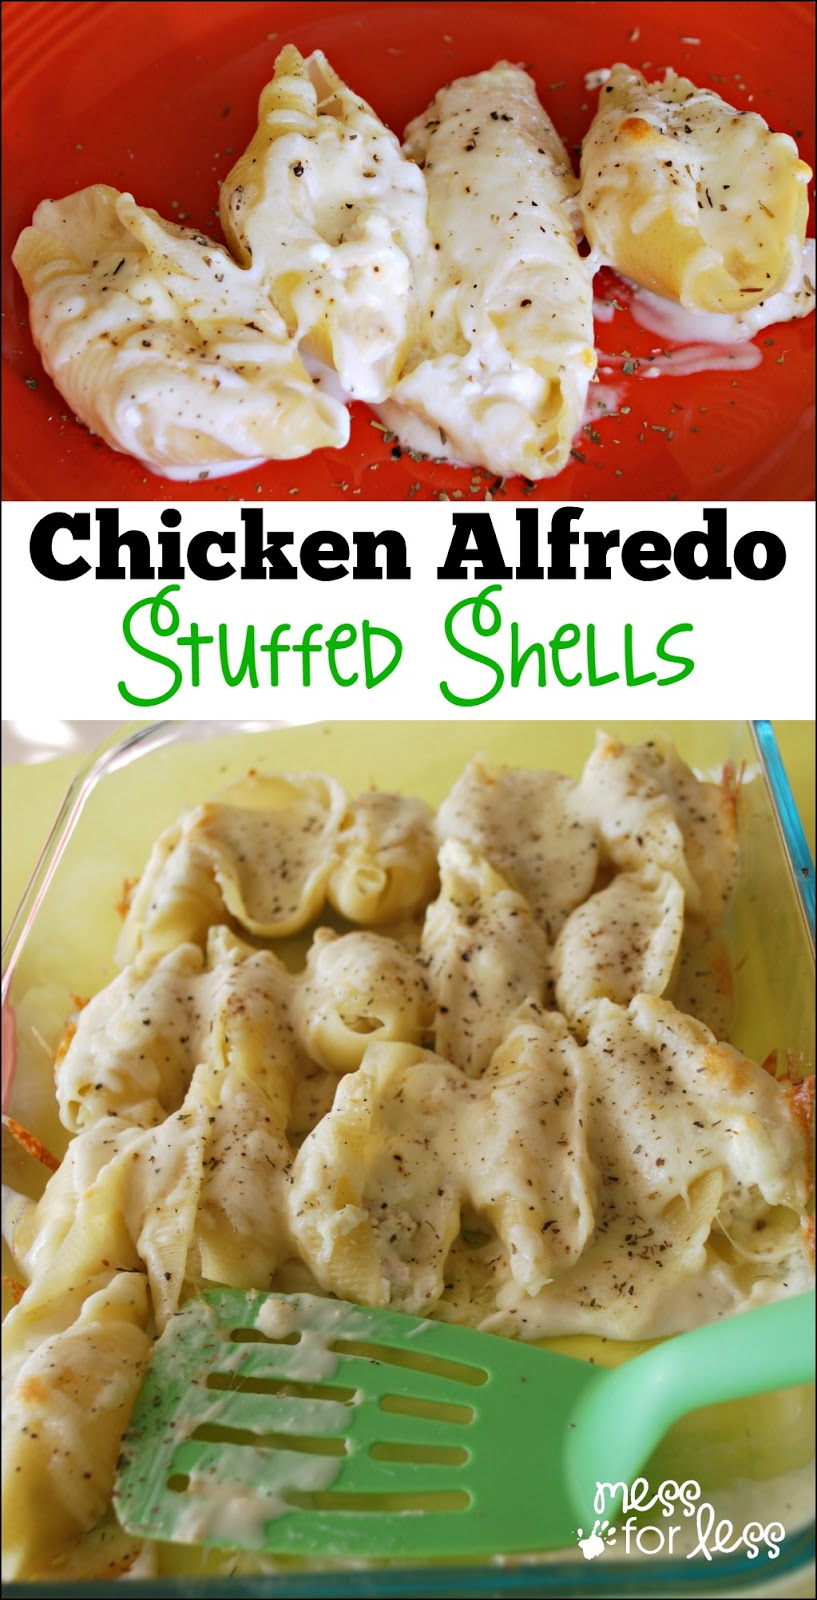 chicken-stuffed-shells1